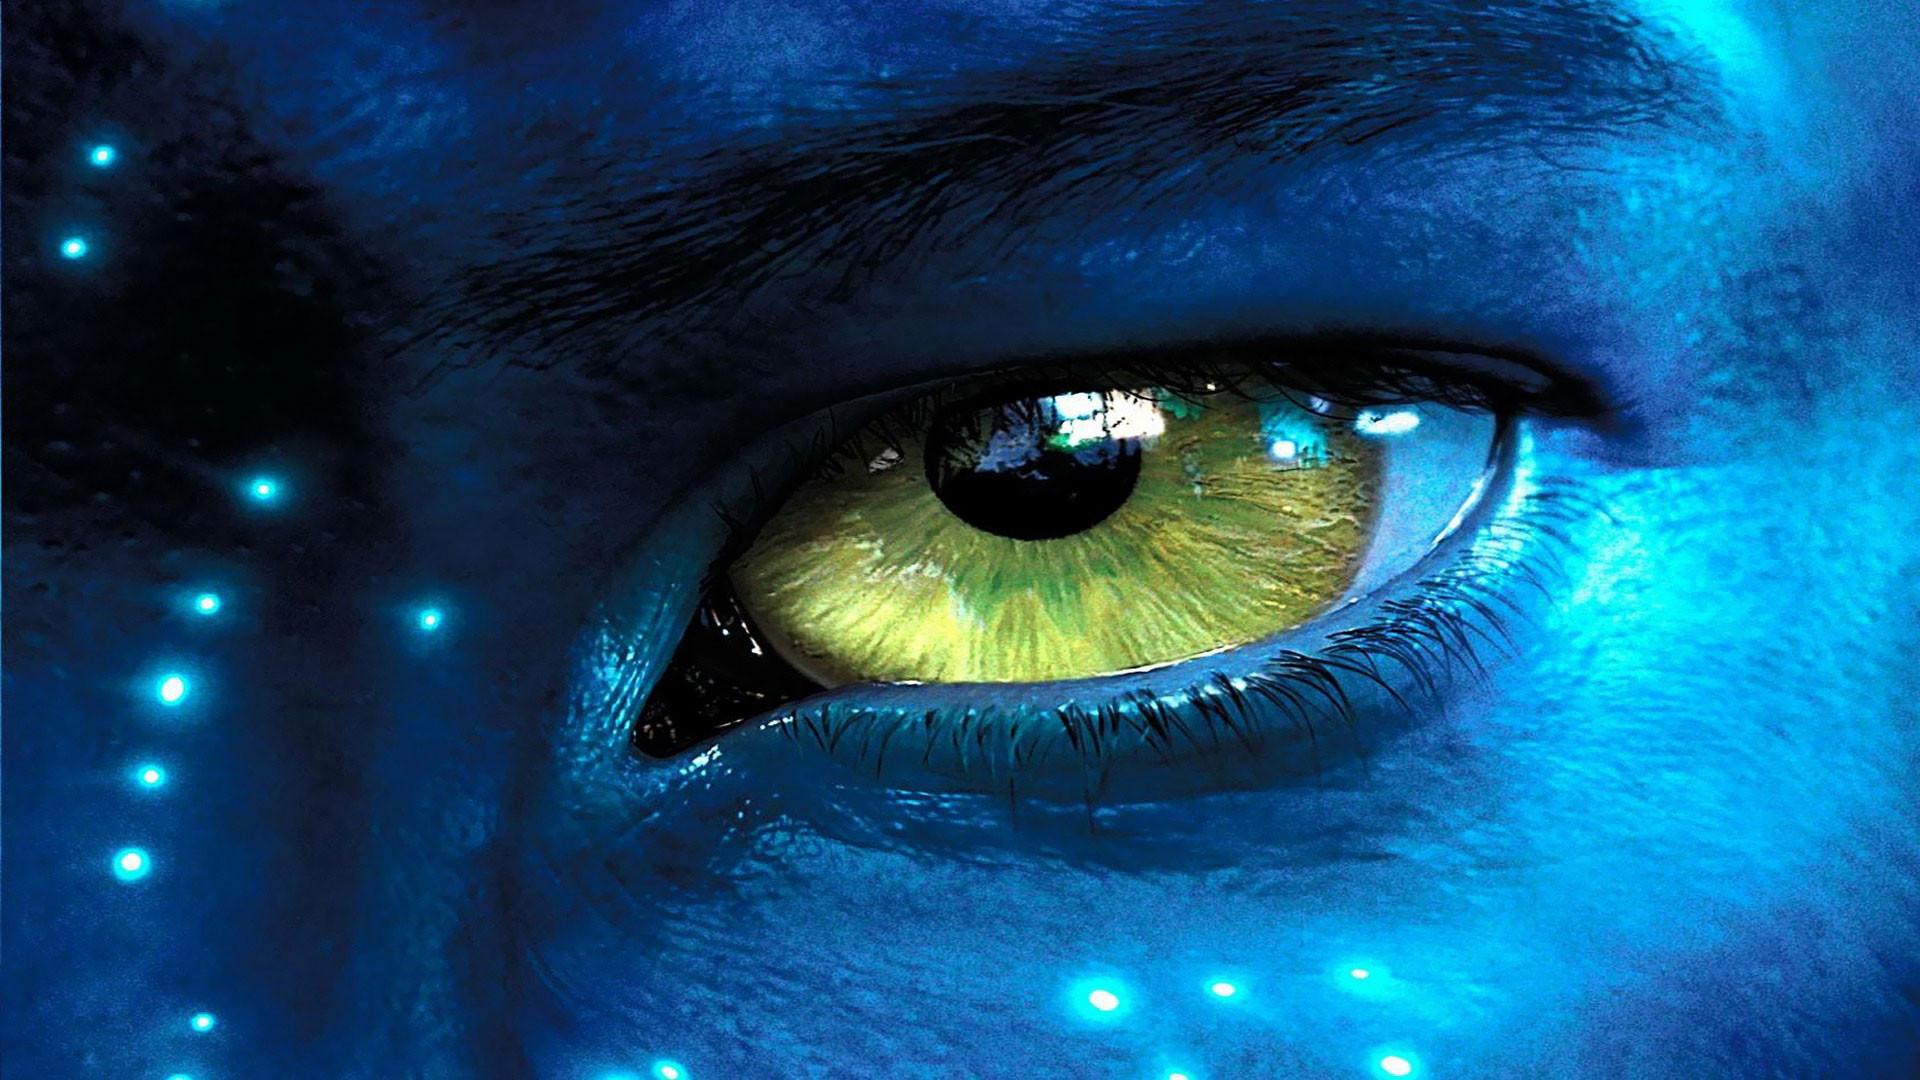 hd pics photos beautiful stunning avatar eye hollywood movie character hd  quality desktop background wallpaper